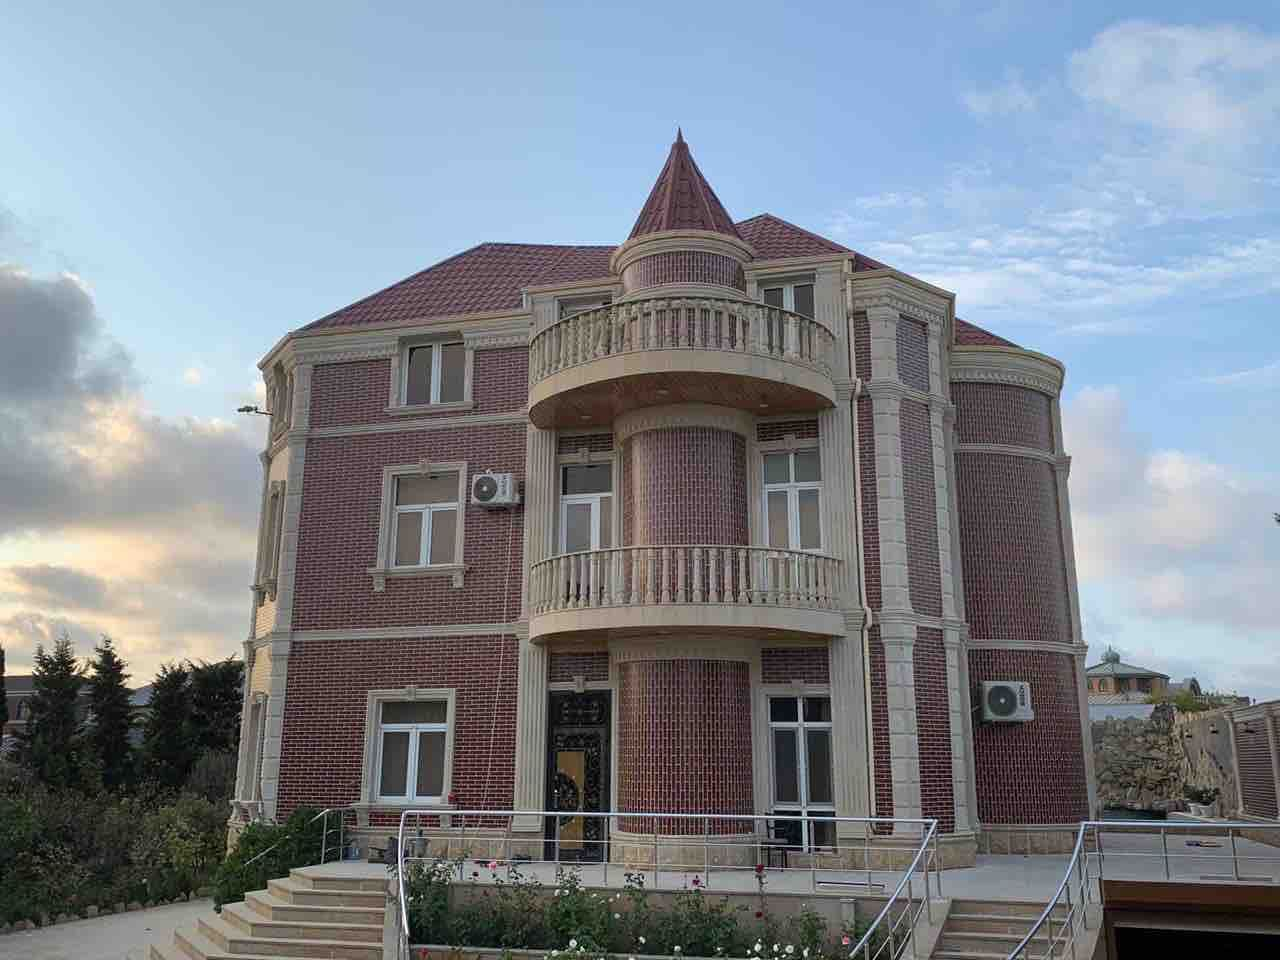 Luxury villa with comfort swimming pool and waterfall  Роскошная вилла с комфортабельным бассейном и водопадом